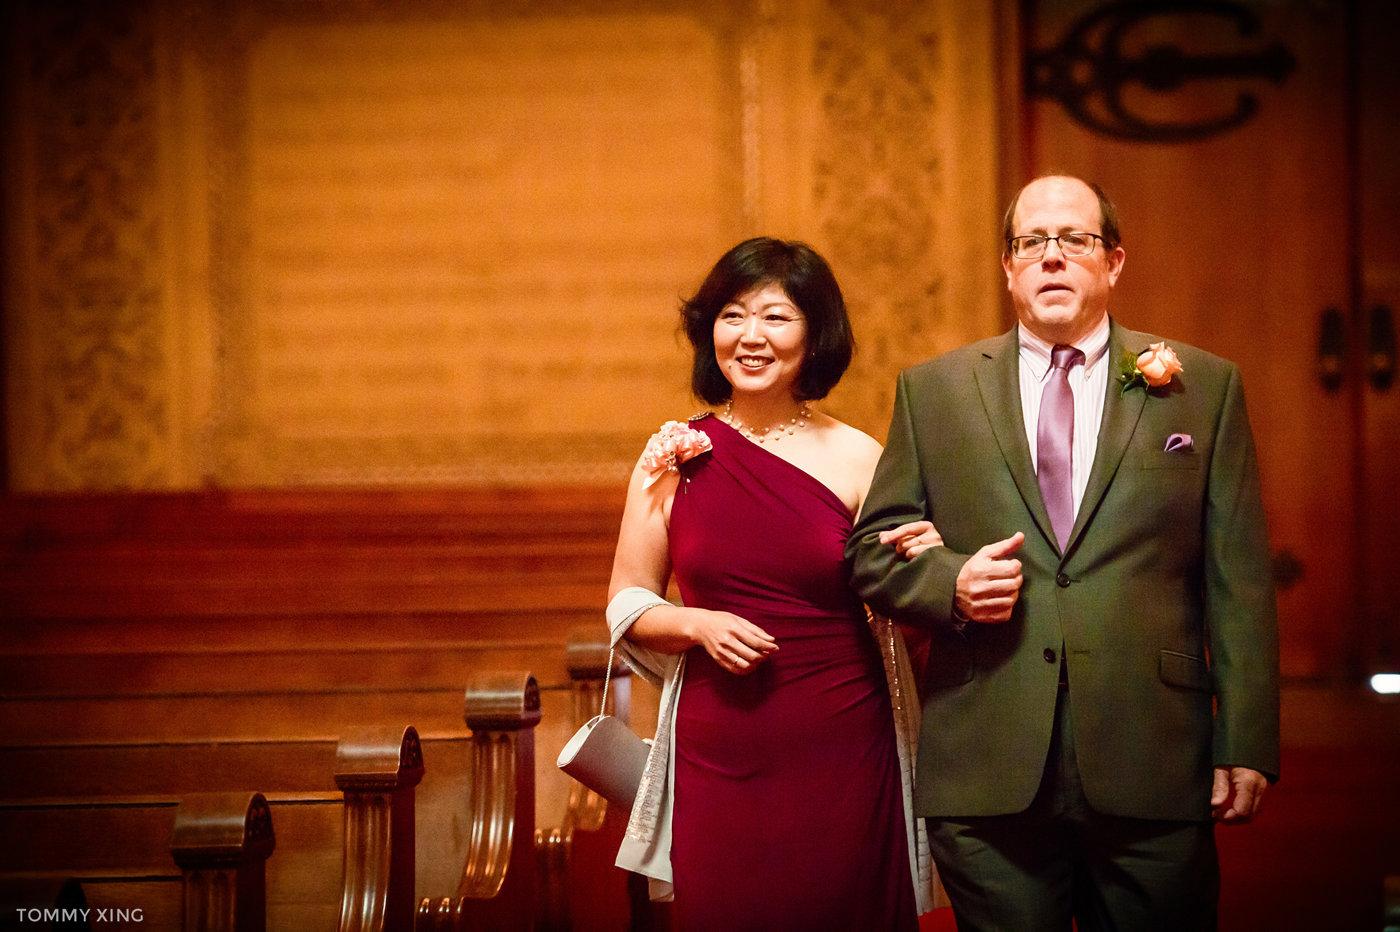 STANFORD MEMORIAL CHURCH WEDDING - Wenjie & Chengcheng - SAN FRANCISCO BAY AREA 斯坦福教堂婚礼跟拍 - 洛杉矶婚礼婚纱照摄影师 Tommy Xing Photography055.jpg